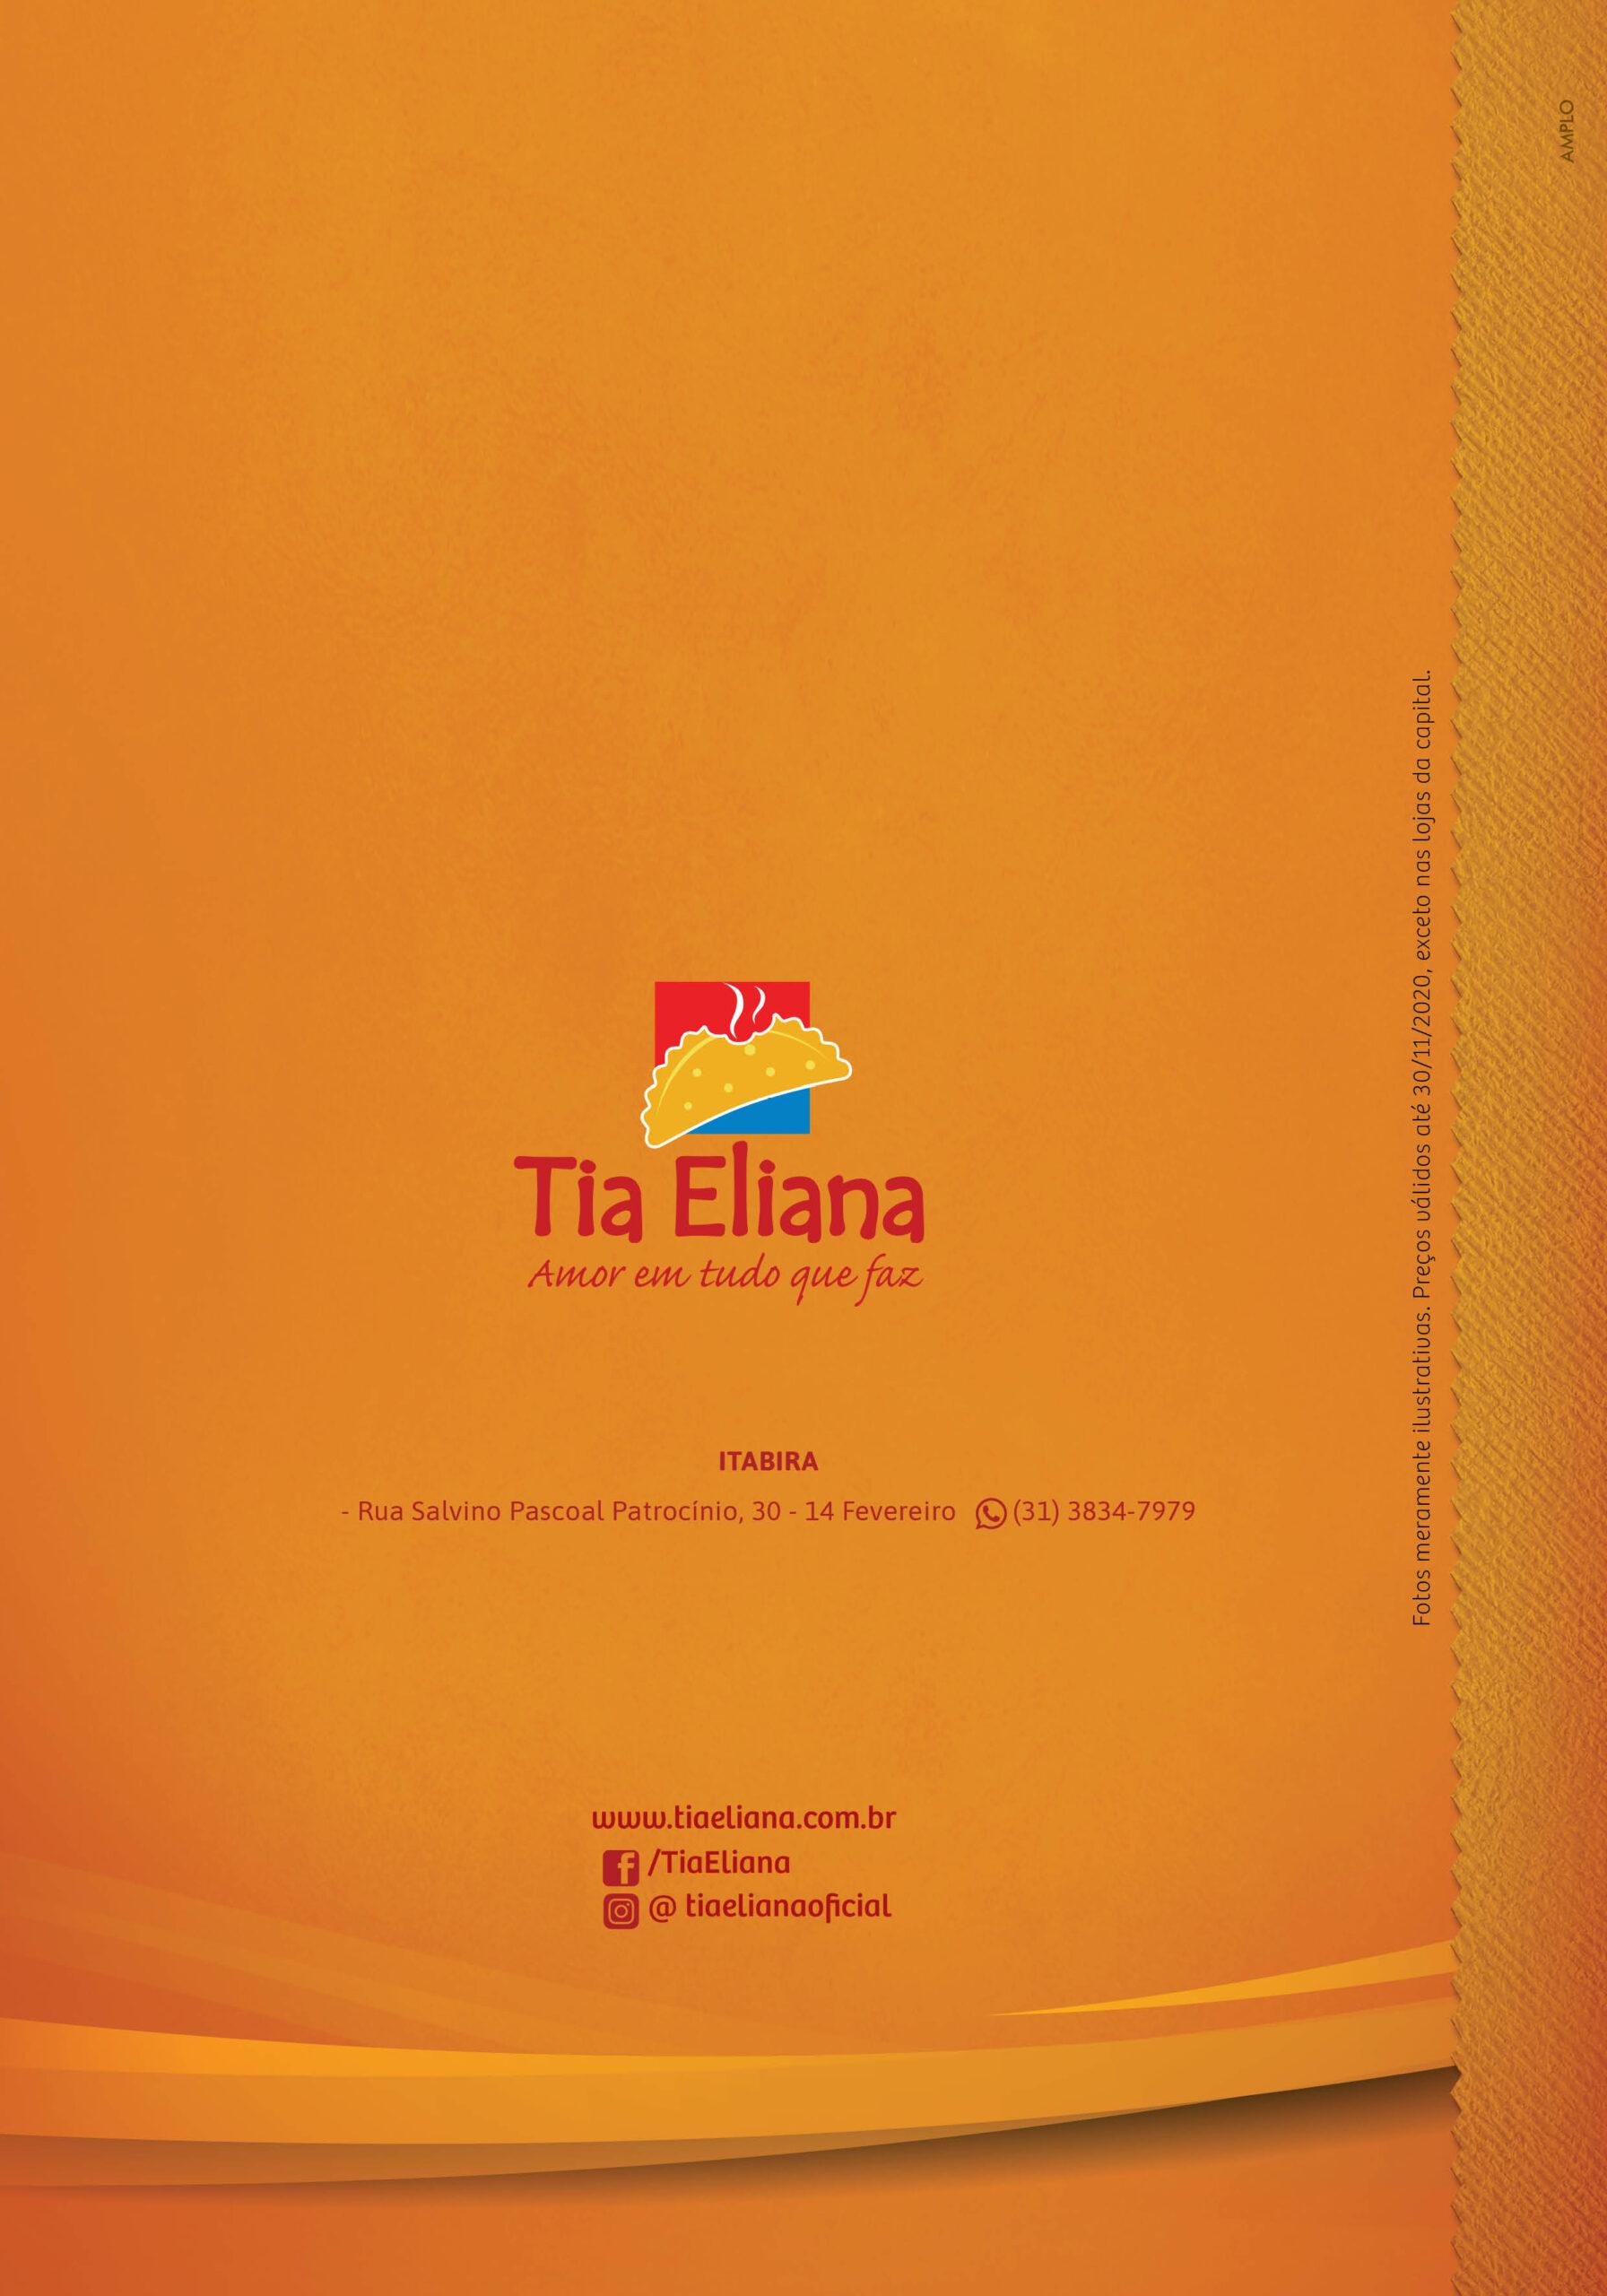 cardapio_completo_interior_a4_2021_tia_eliana_itabira_sp12-scaled Itabira - Salvino Pascoal